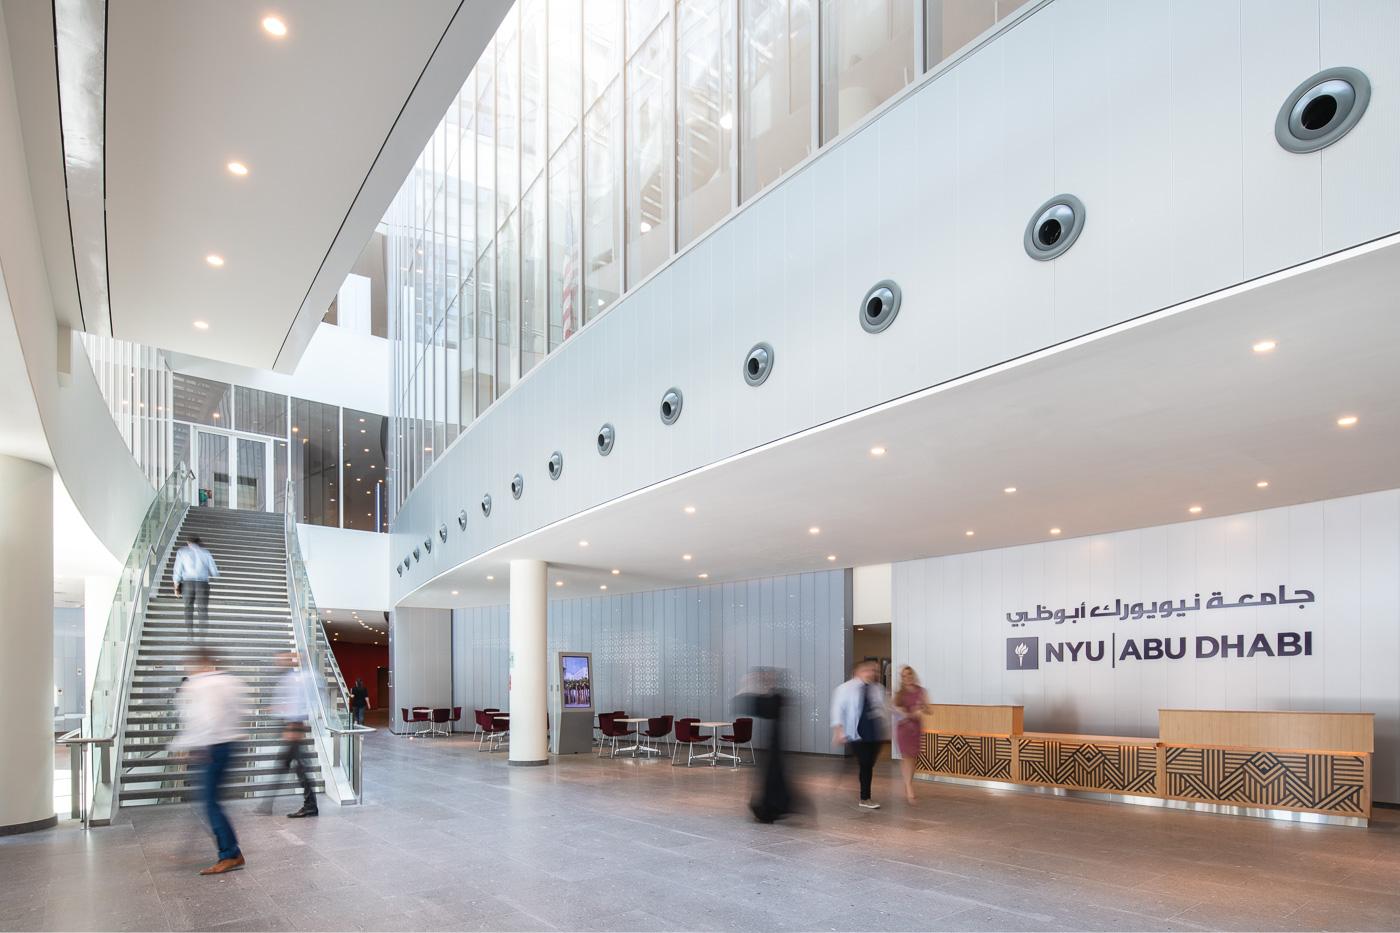 New York University Abu Dhabi